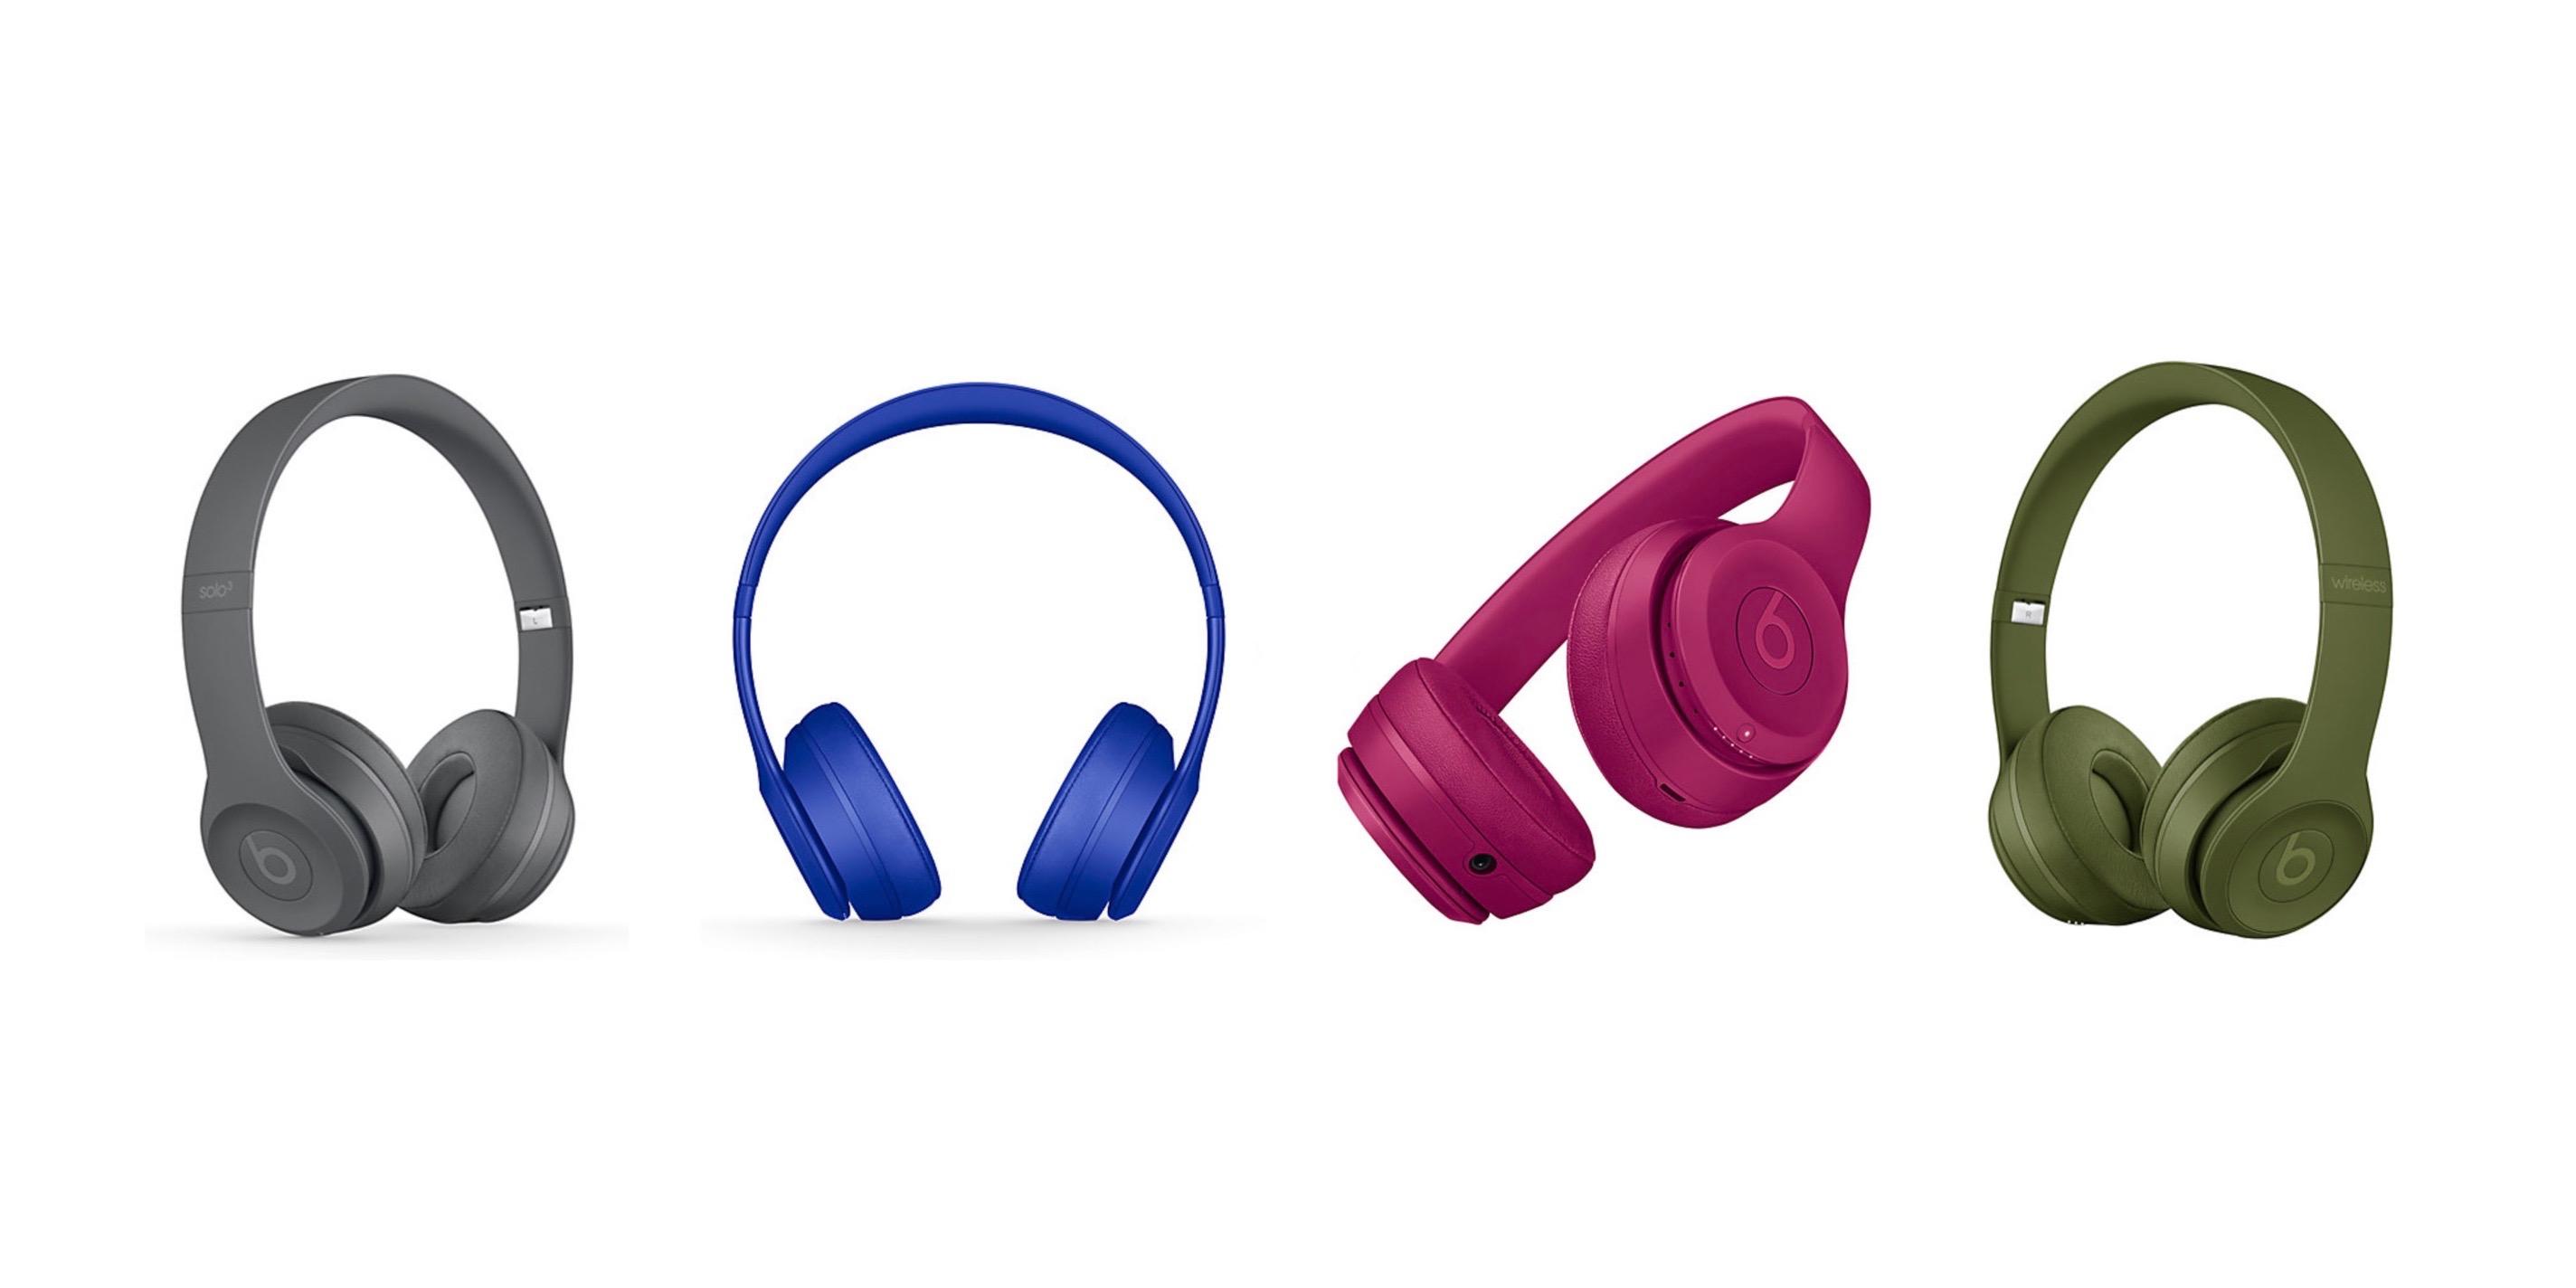 Apple Releases Fresh Colors For Beats Solo3 Wireless Headphones U 9to5mac